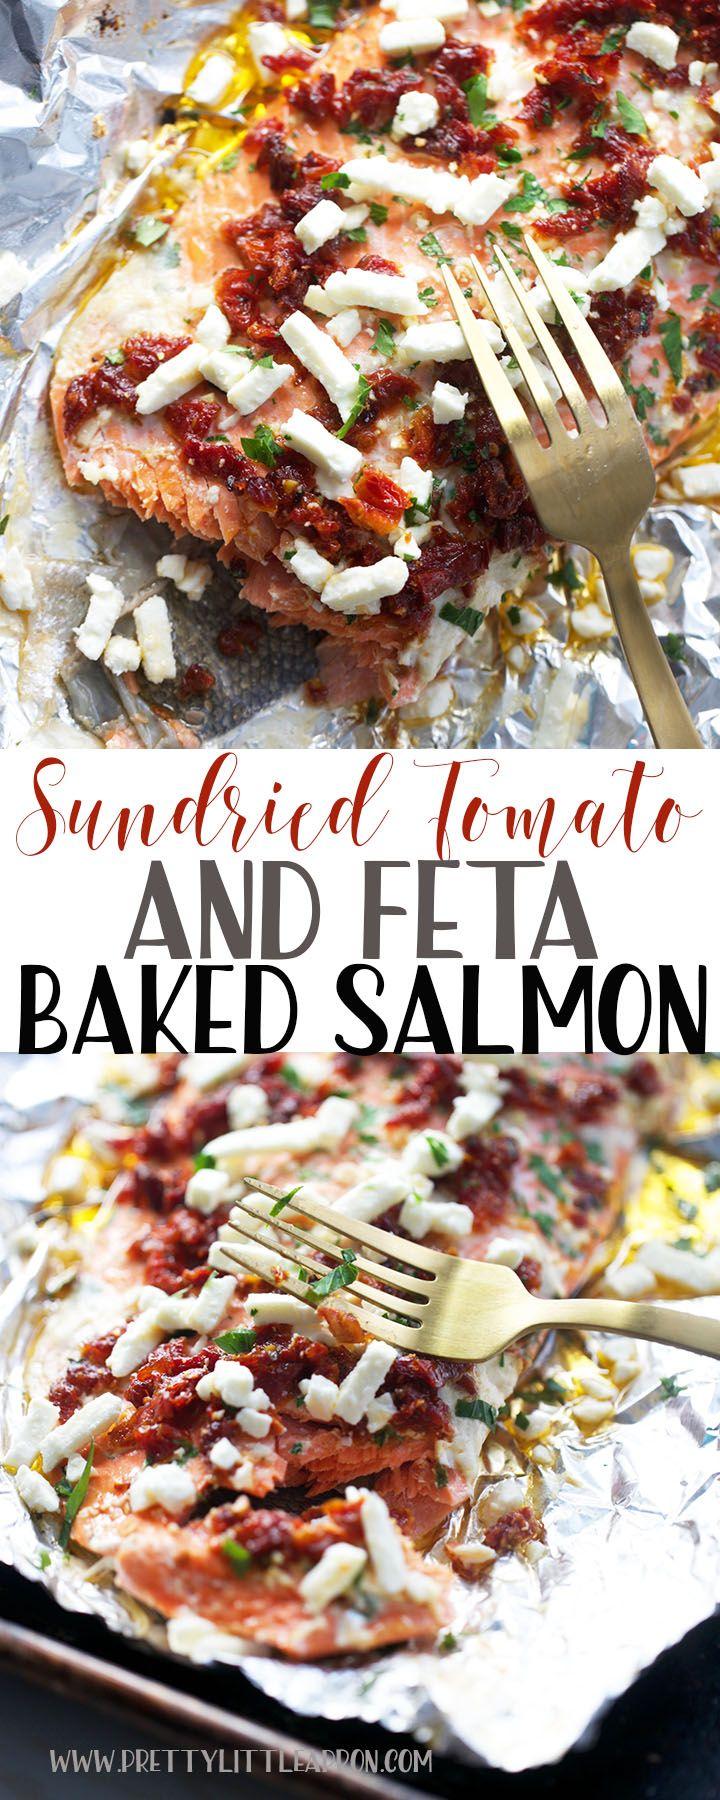 Sundried Tomato Feta Baked Salmon